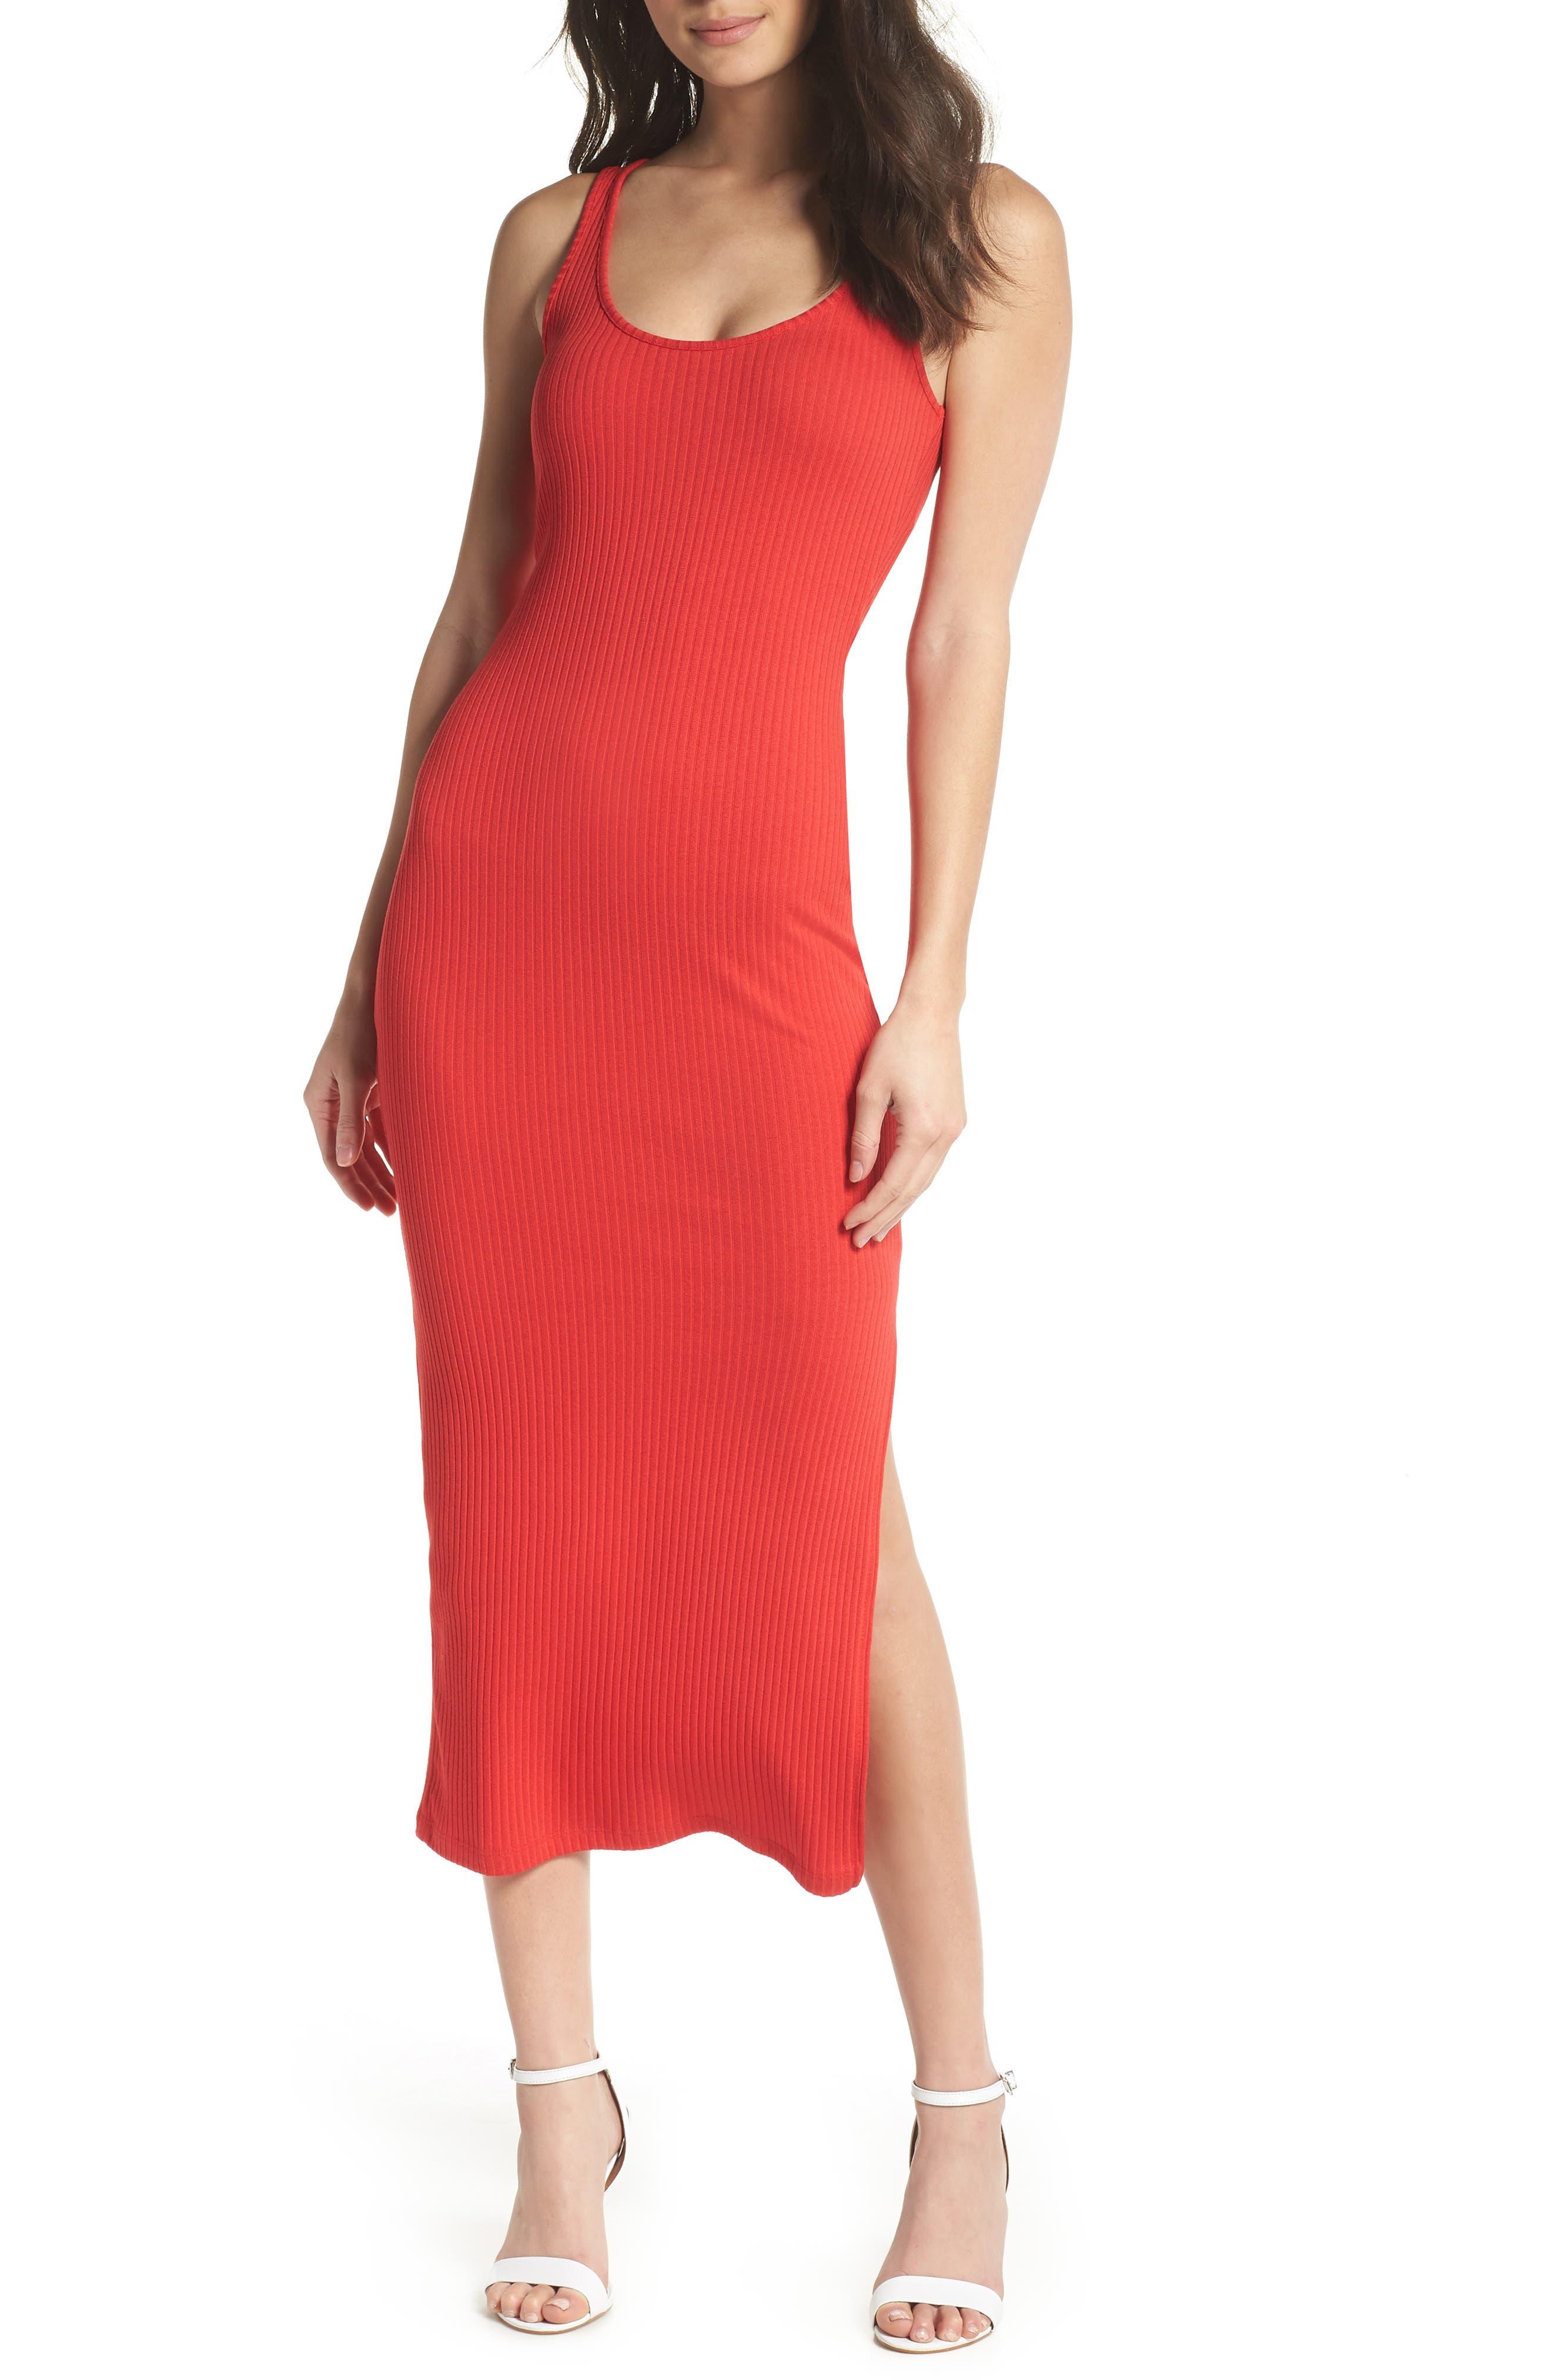 Tommy Rib Knit Tank Dress,                             Main thumbnail 1, color,                             SHANGHAI RED